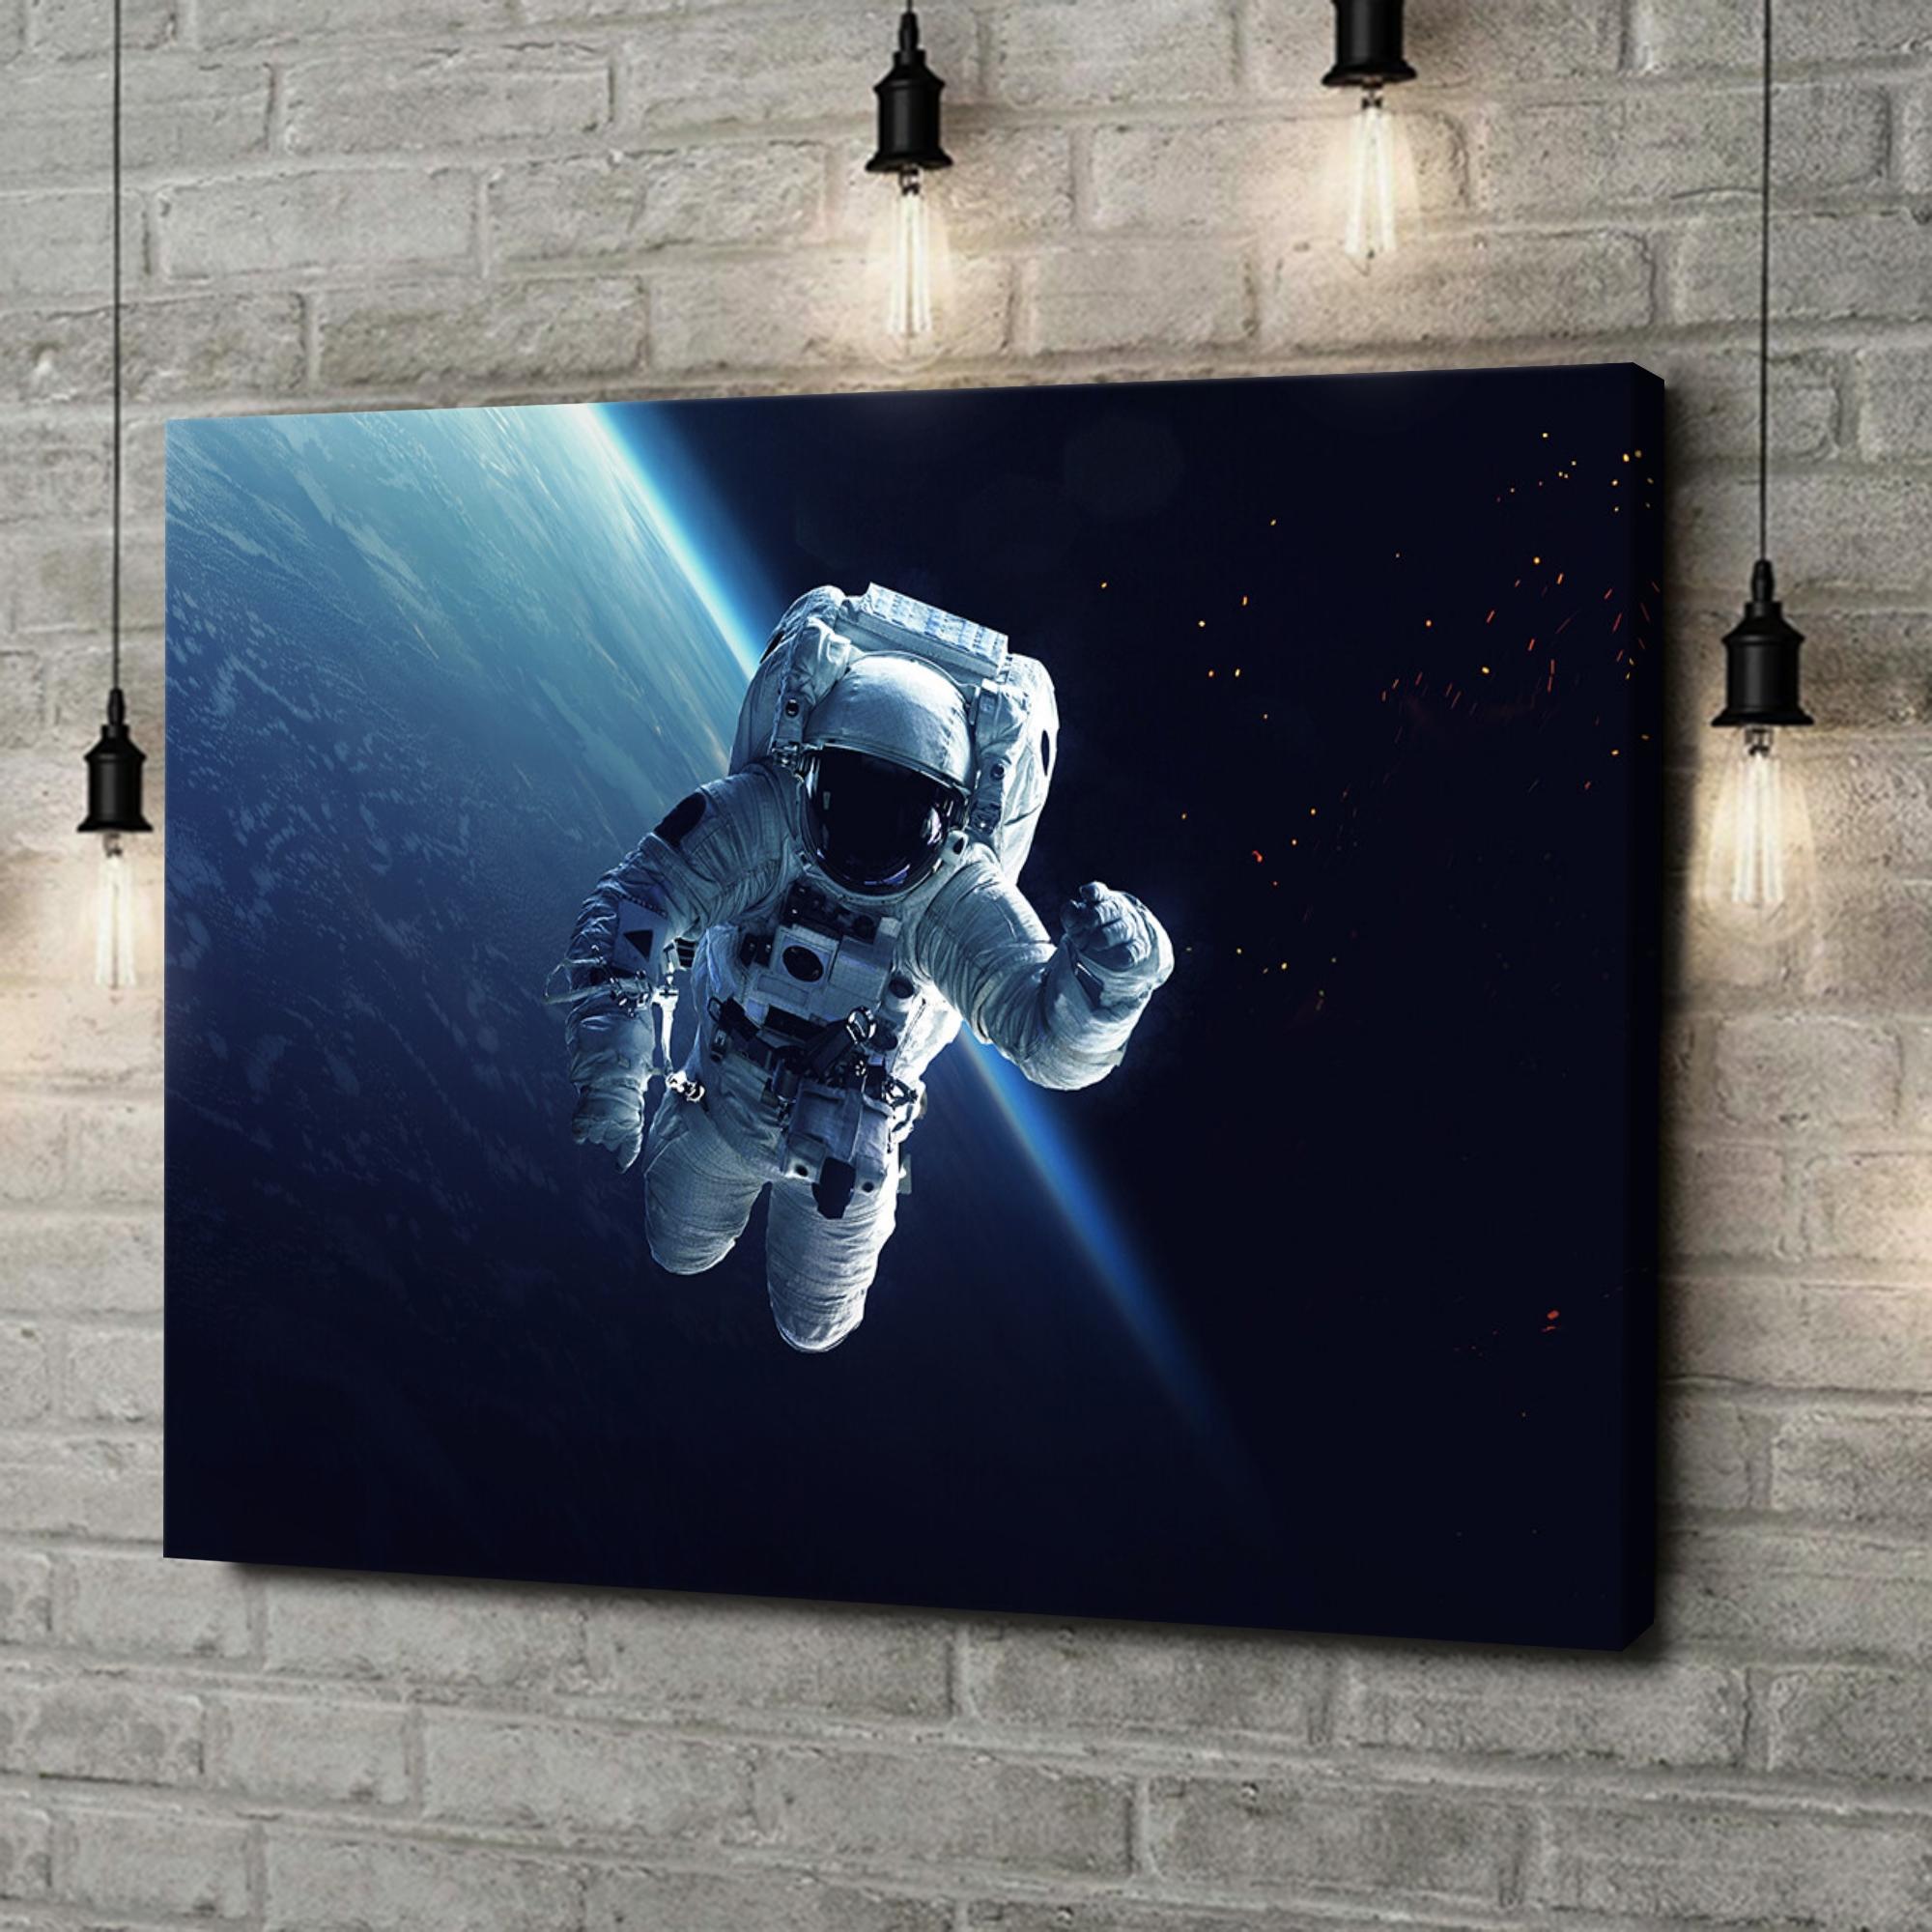 Leinwandbild personalisiert Weltraumspaziergang